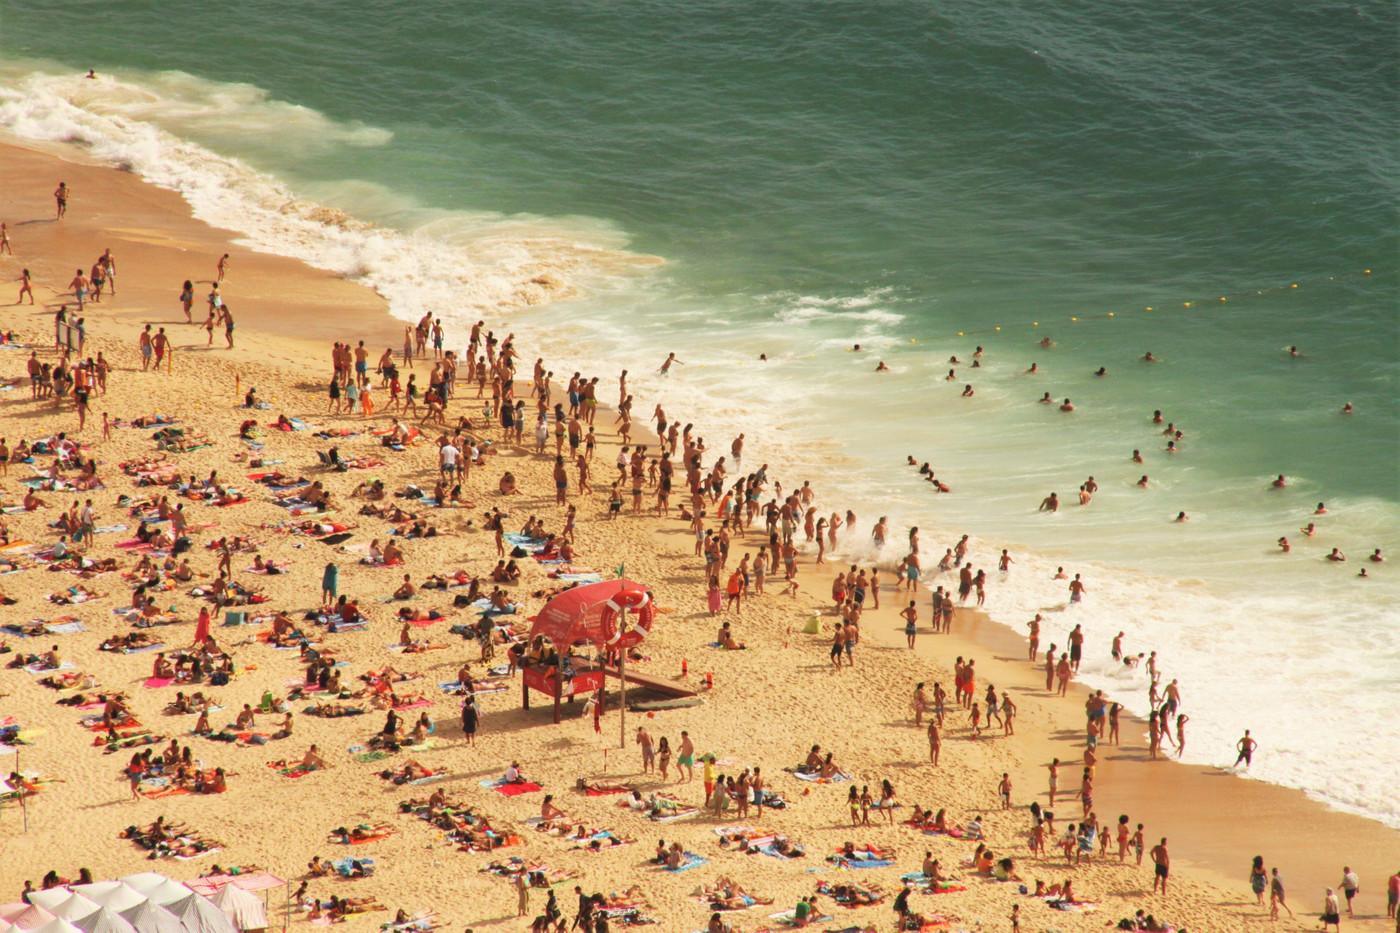 Playa de Bogatell,